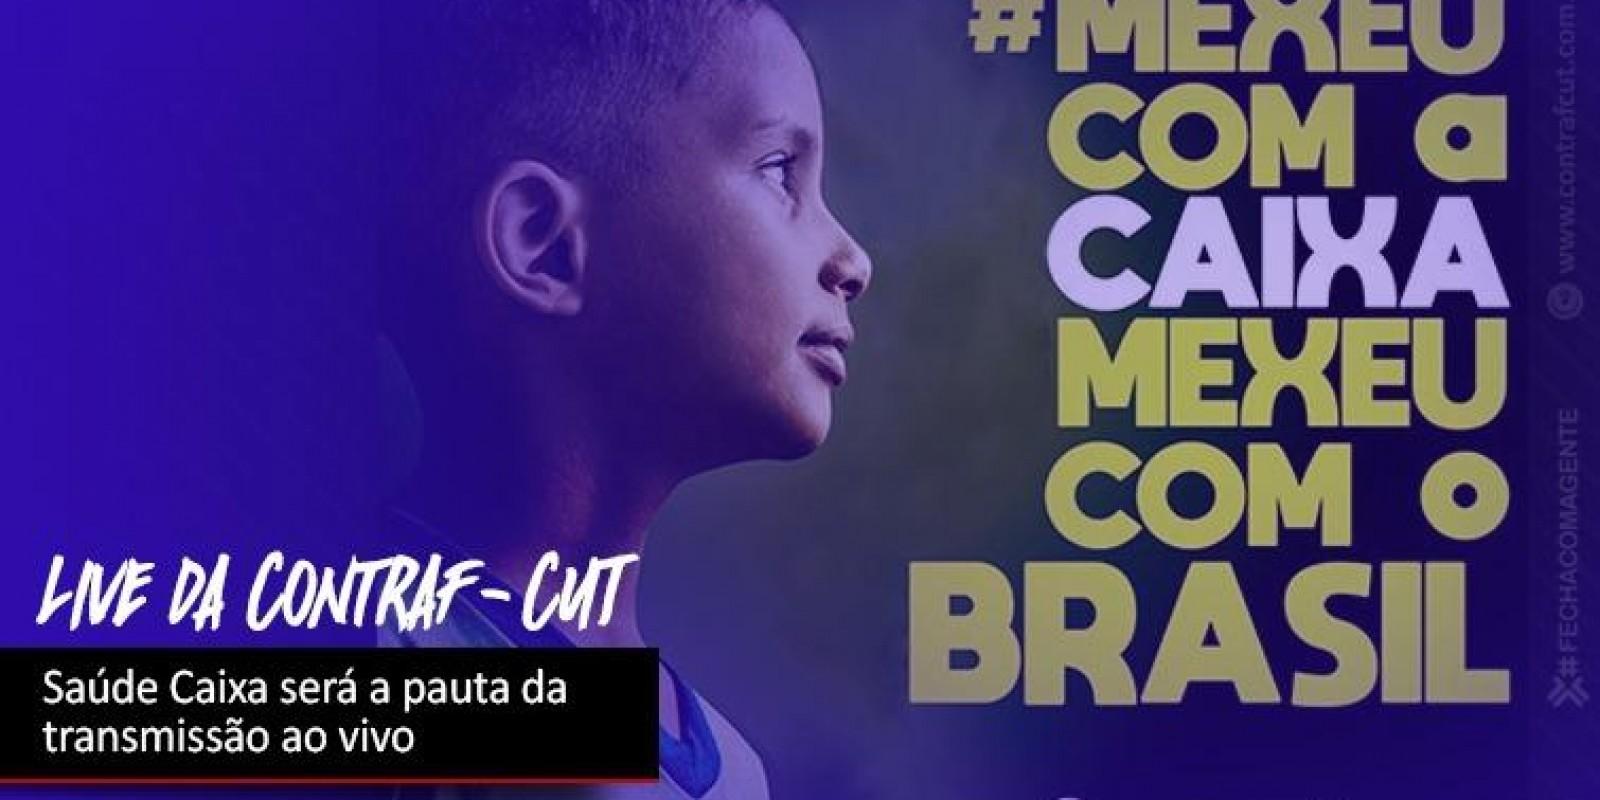 Contraf-CUT fará live sobre Saúde Caixa